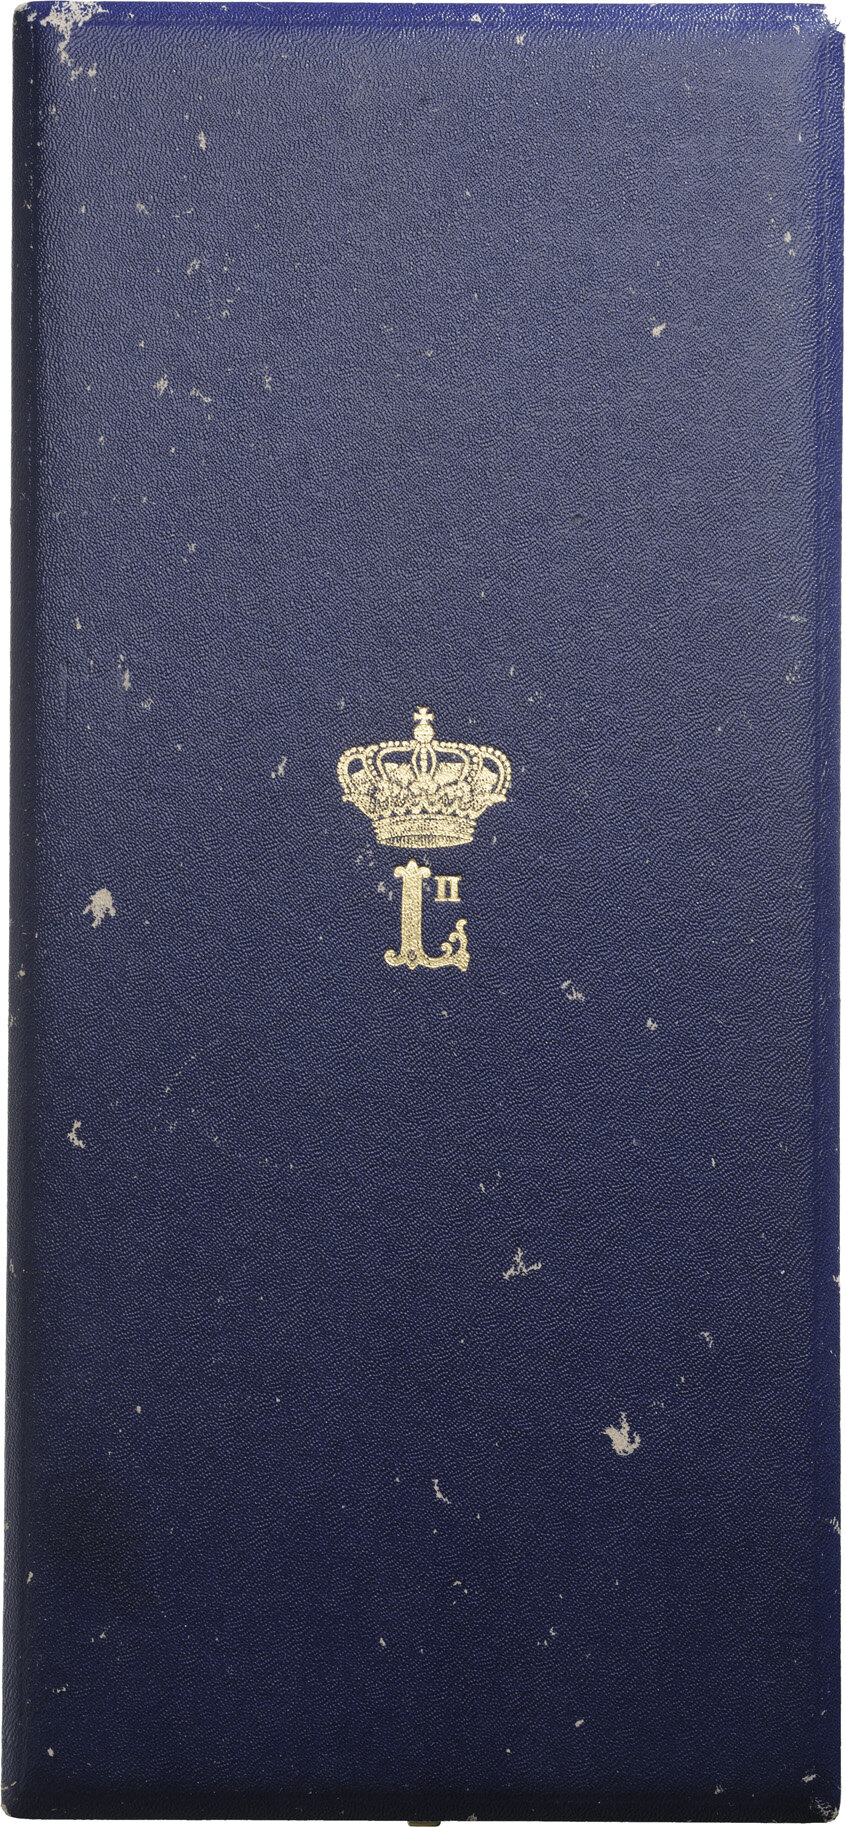 Lot 1392 - ORDER OF LEOPOLD II